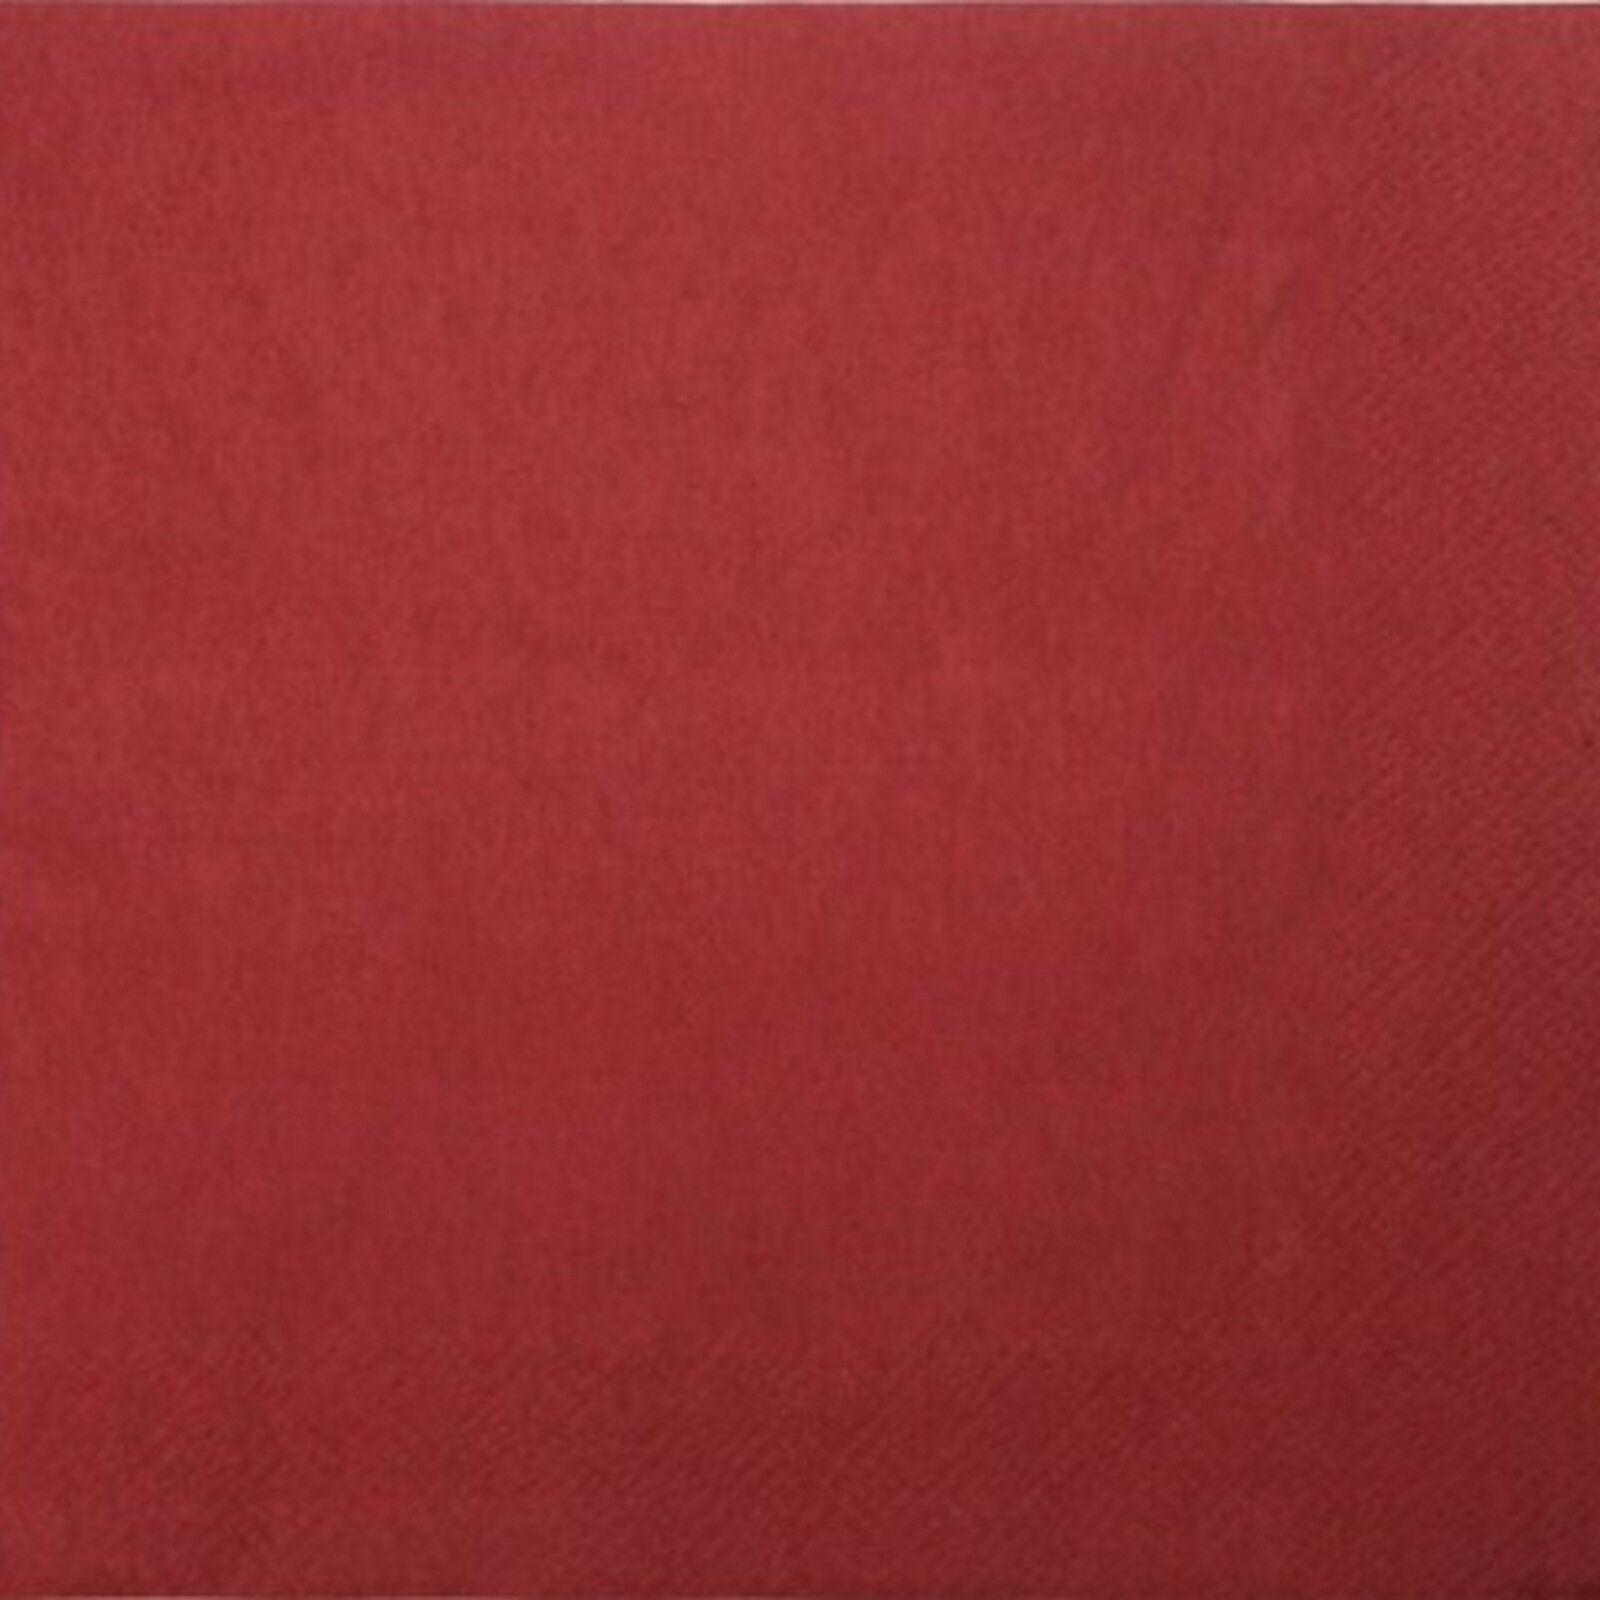 200 - 1.000 Stück Servietten 3-lagig 33x33 cm  Papierservietten Tissue-Qualität - Bordeaux, 200 Stück